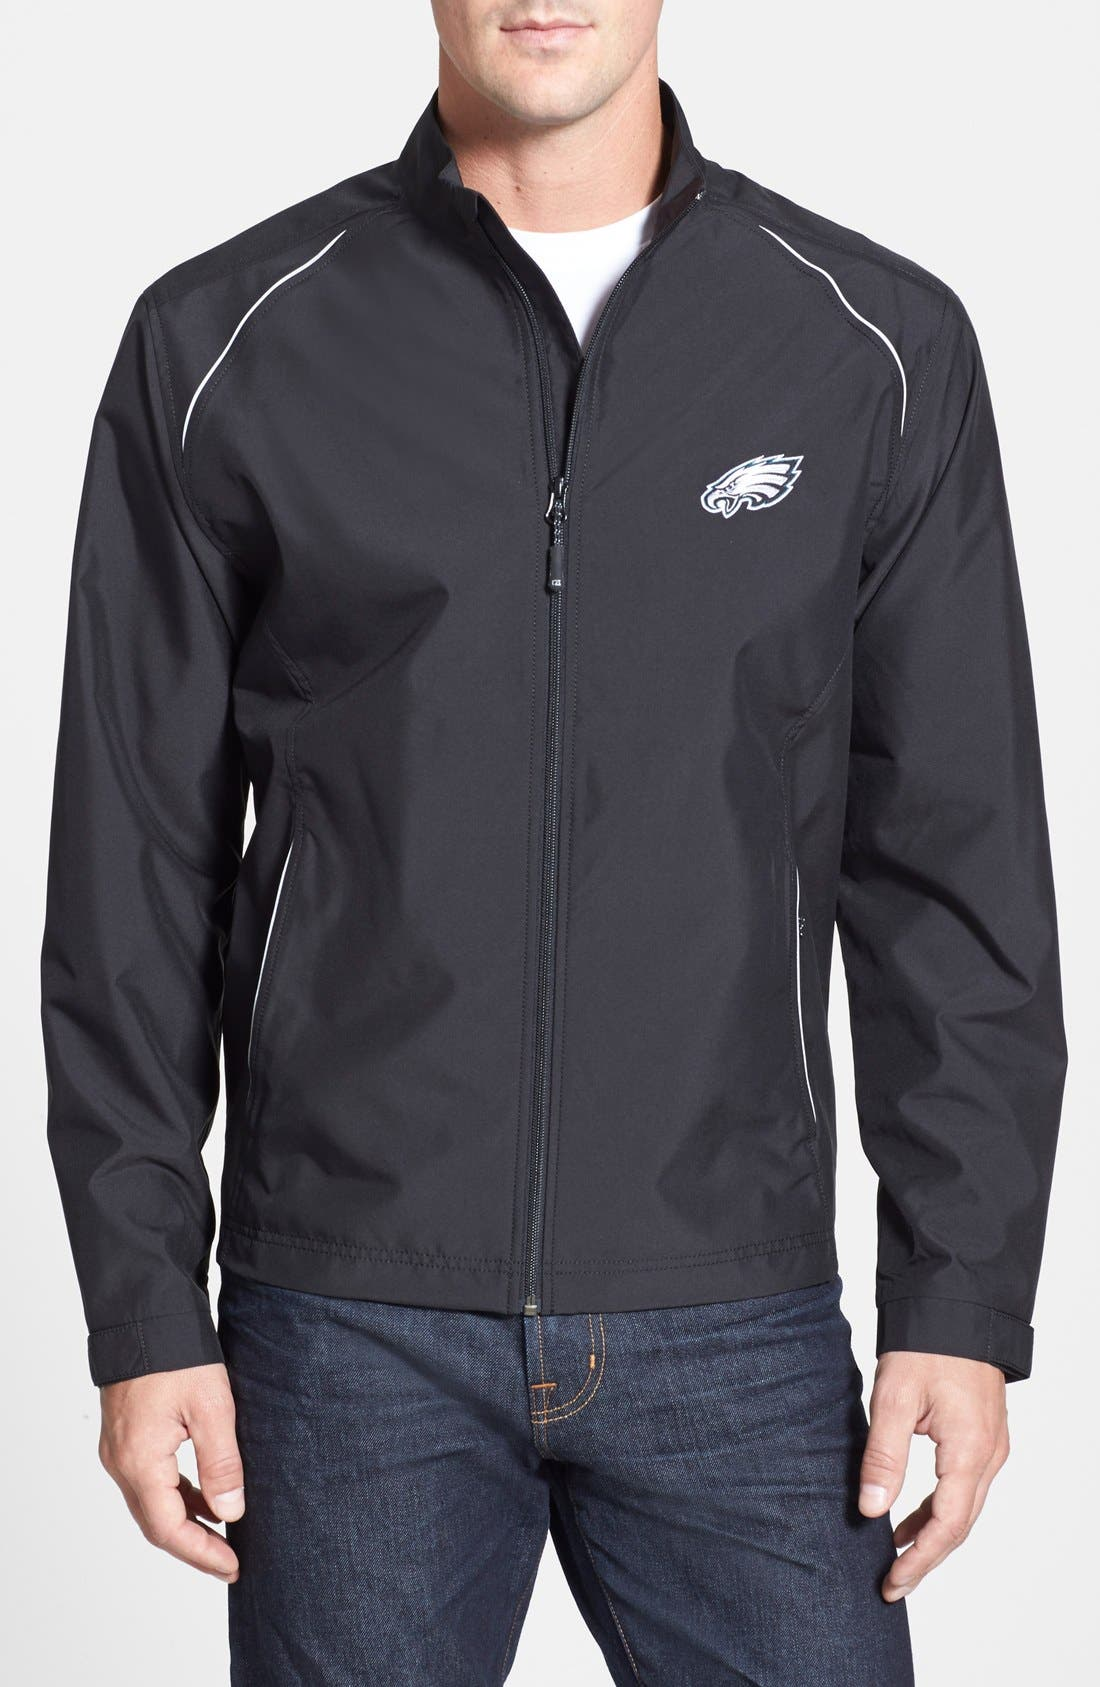 Alternate Image 1 Selected - Cutter & Buck Philadelphia Eagles - Beacon WeatherTec Wind & Water Resistant Jacket